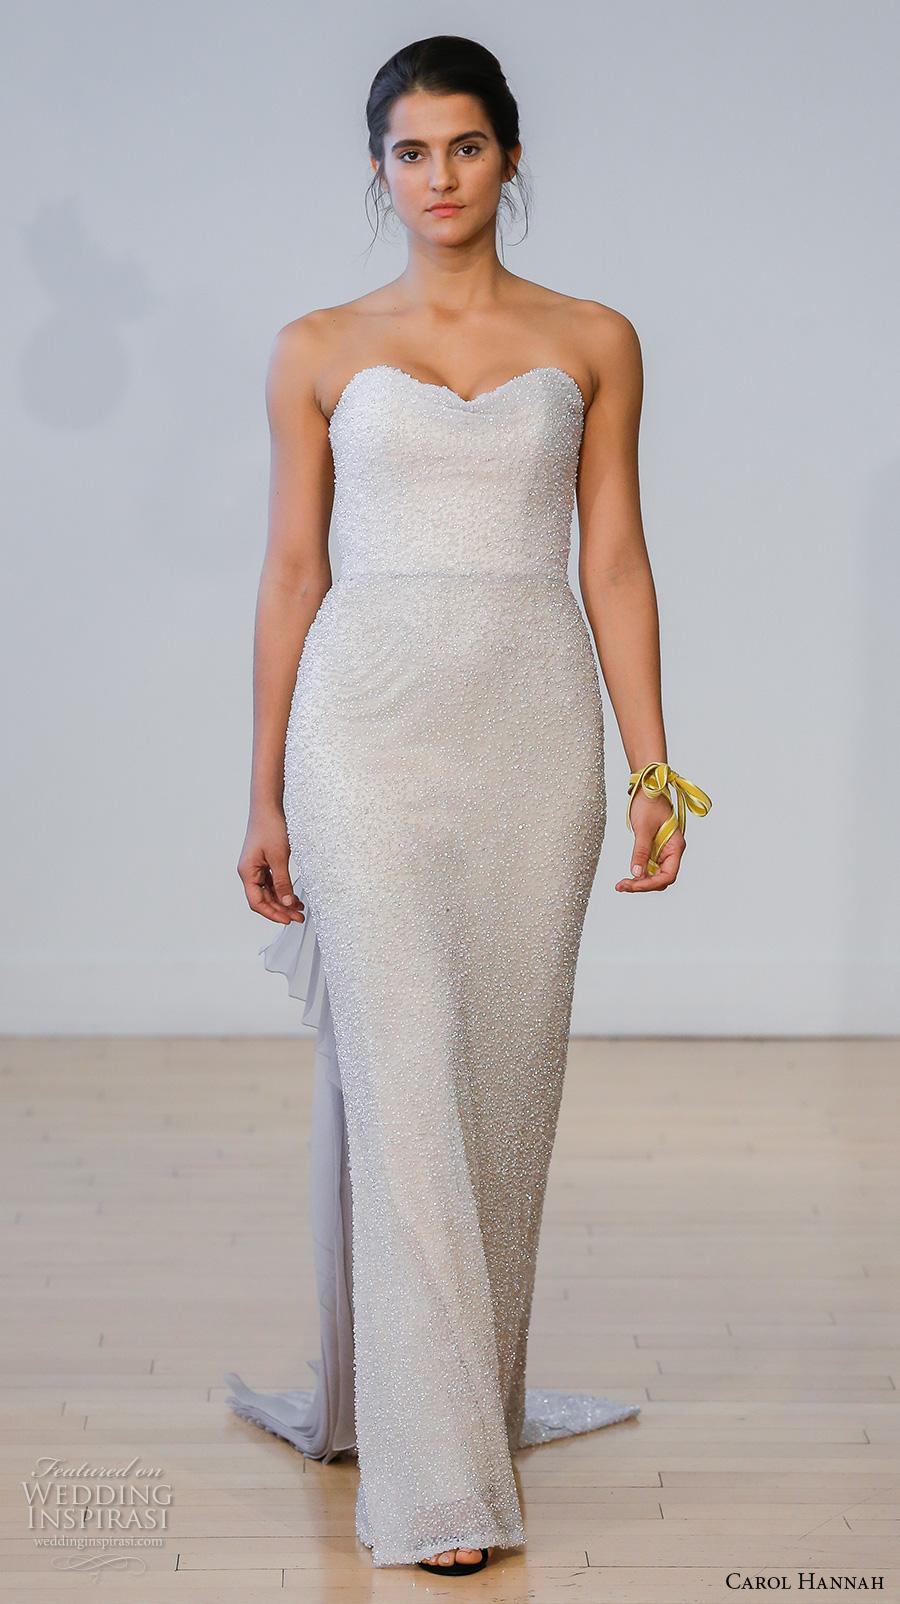 Carol Hannah 2017 Wedding Dresses - crazyforus